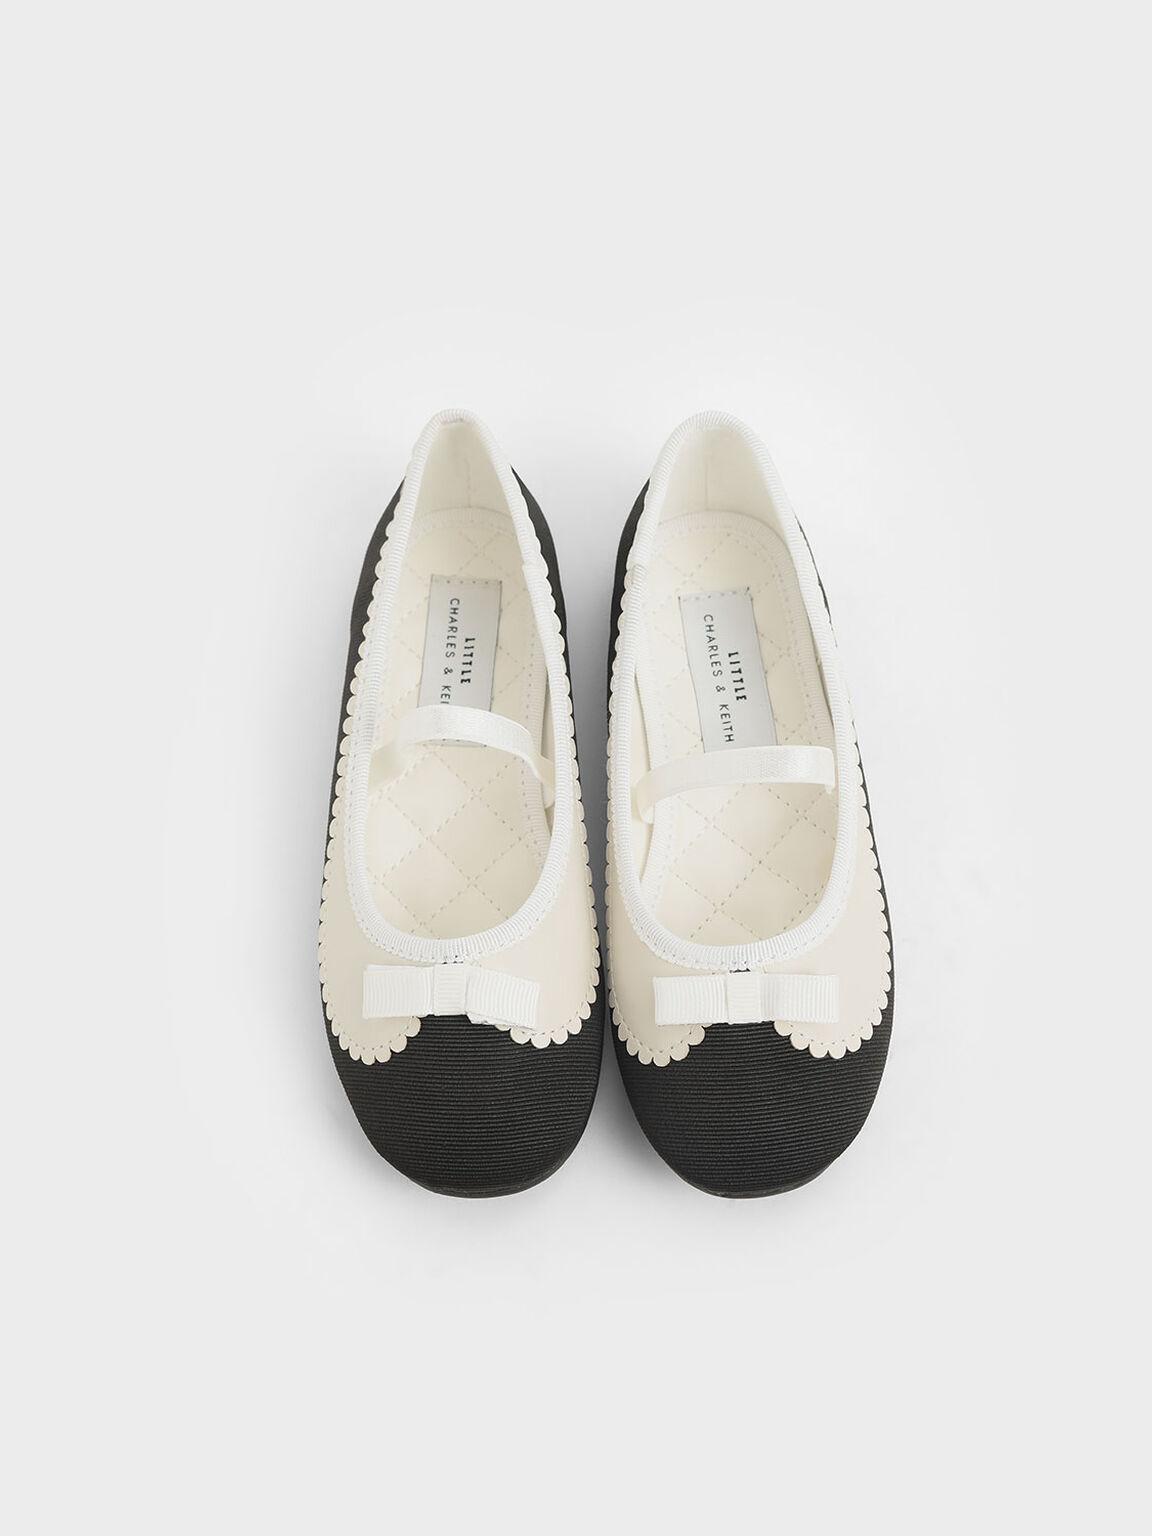 Sepatu Flat Balerina Hiasan Kerang Grosgrain Anak Perempuan, Black, hi-res